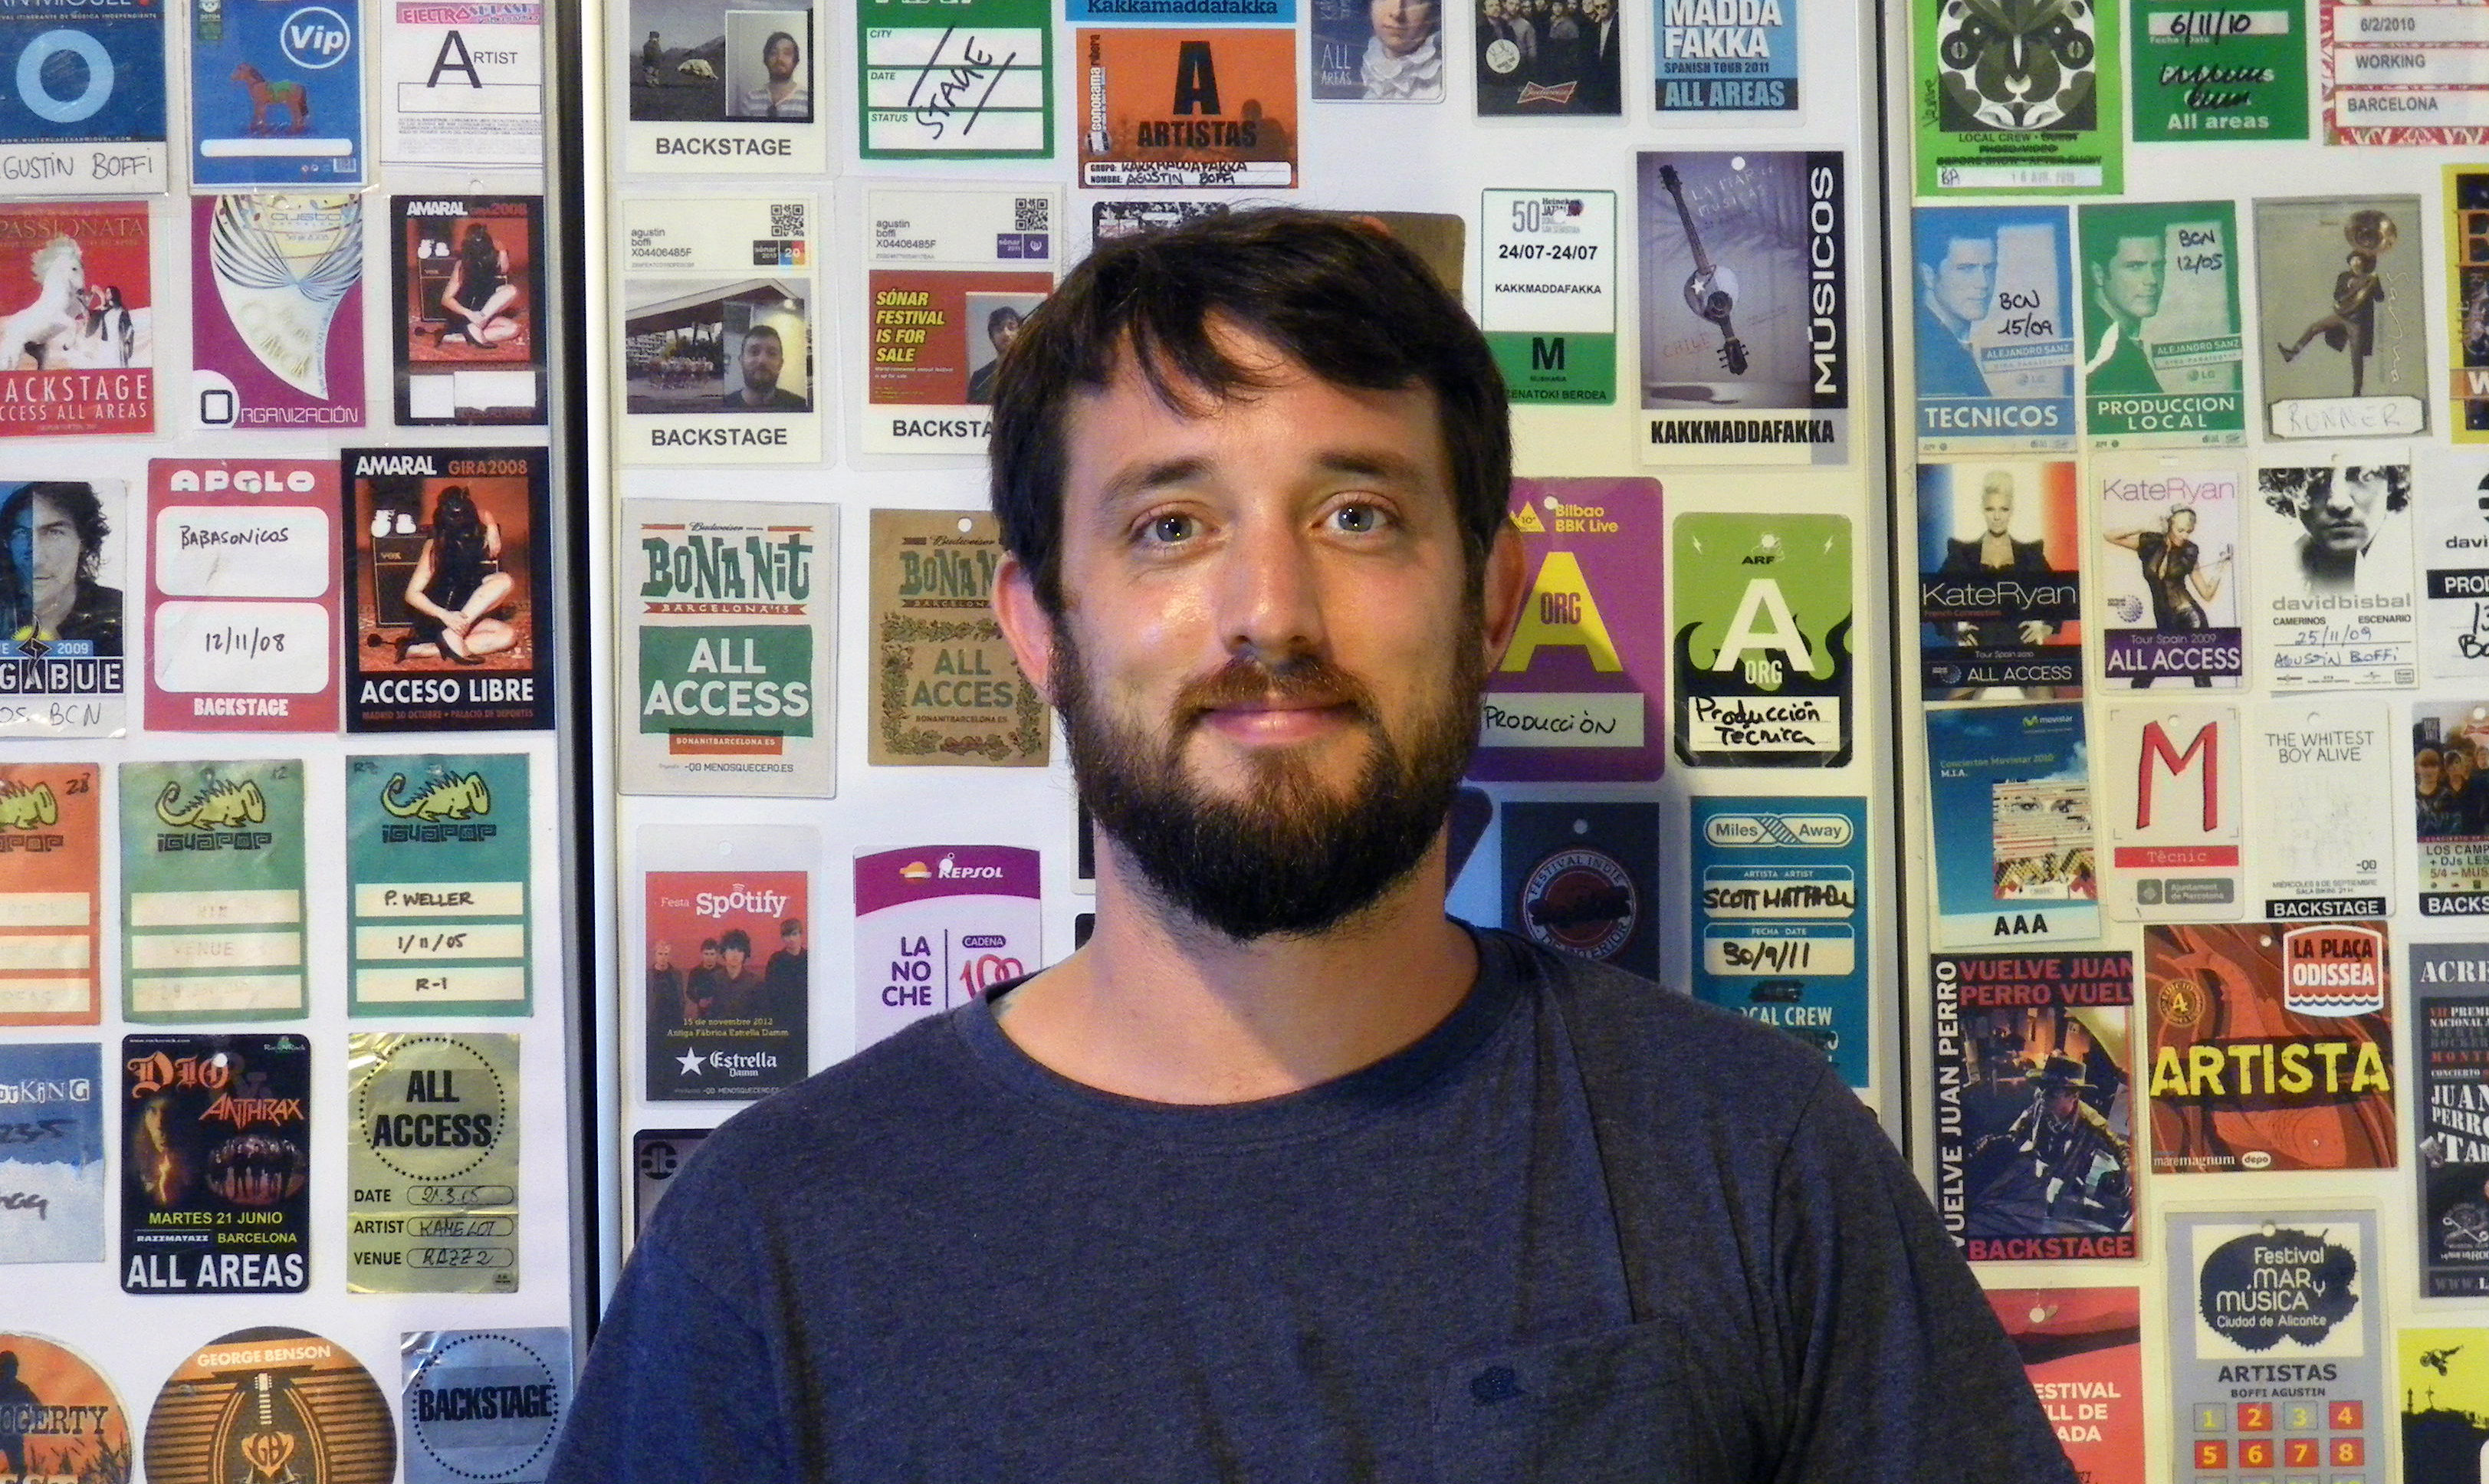 Hablamos con Agustin Boffi, Tour Manager de David Bisbal